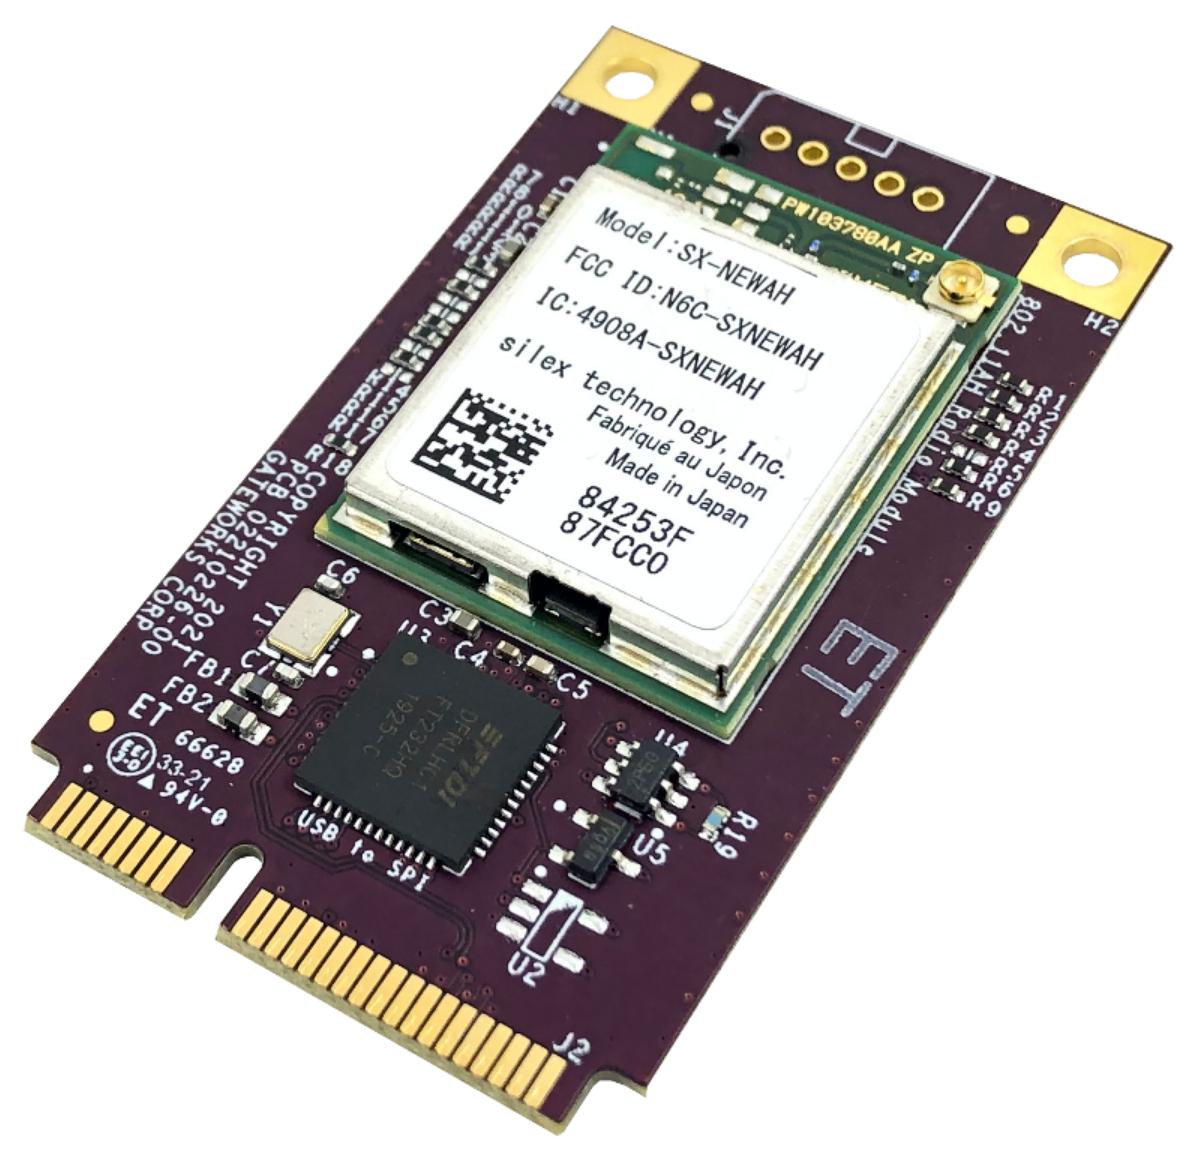 GW16146 802.11ah HaLow WiFi Mini-PCIe Radio